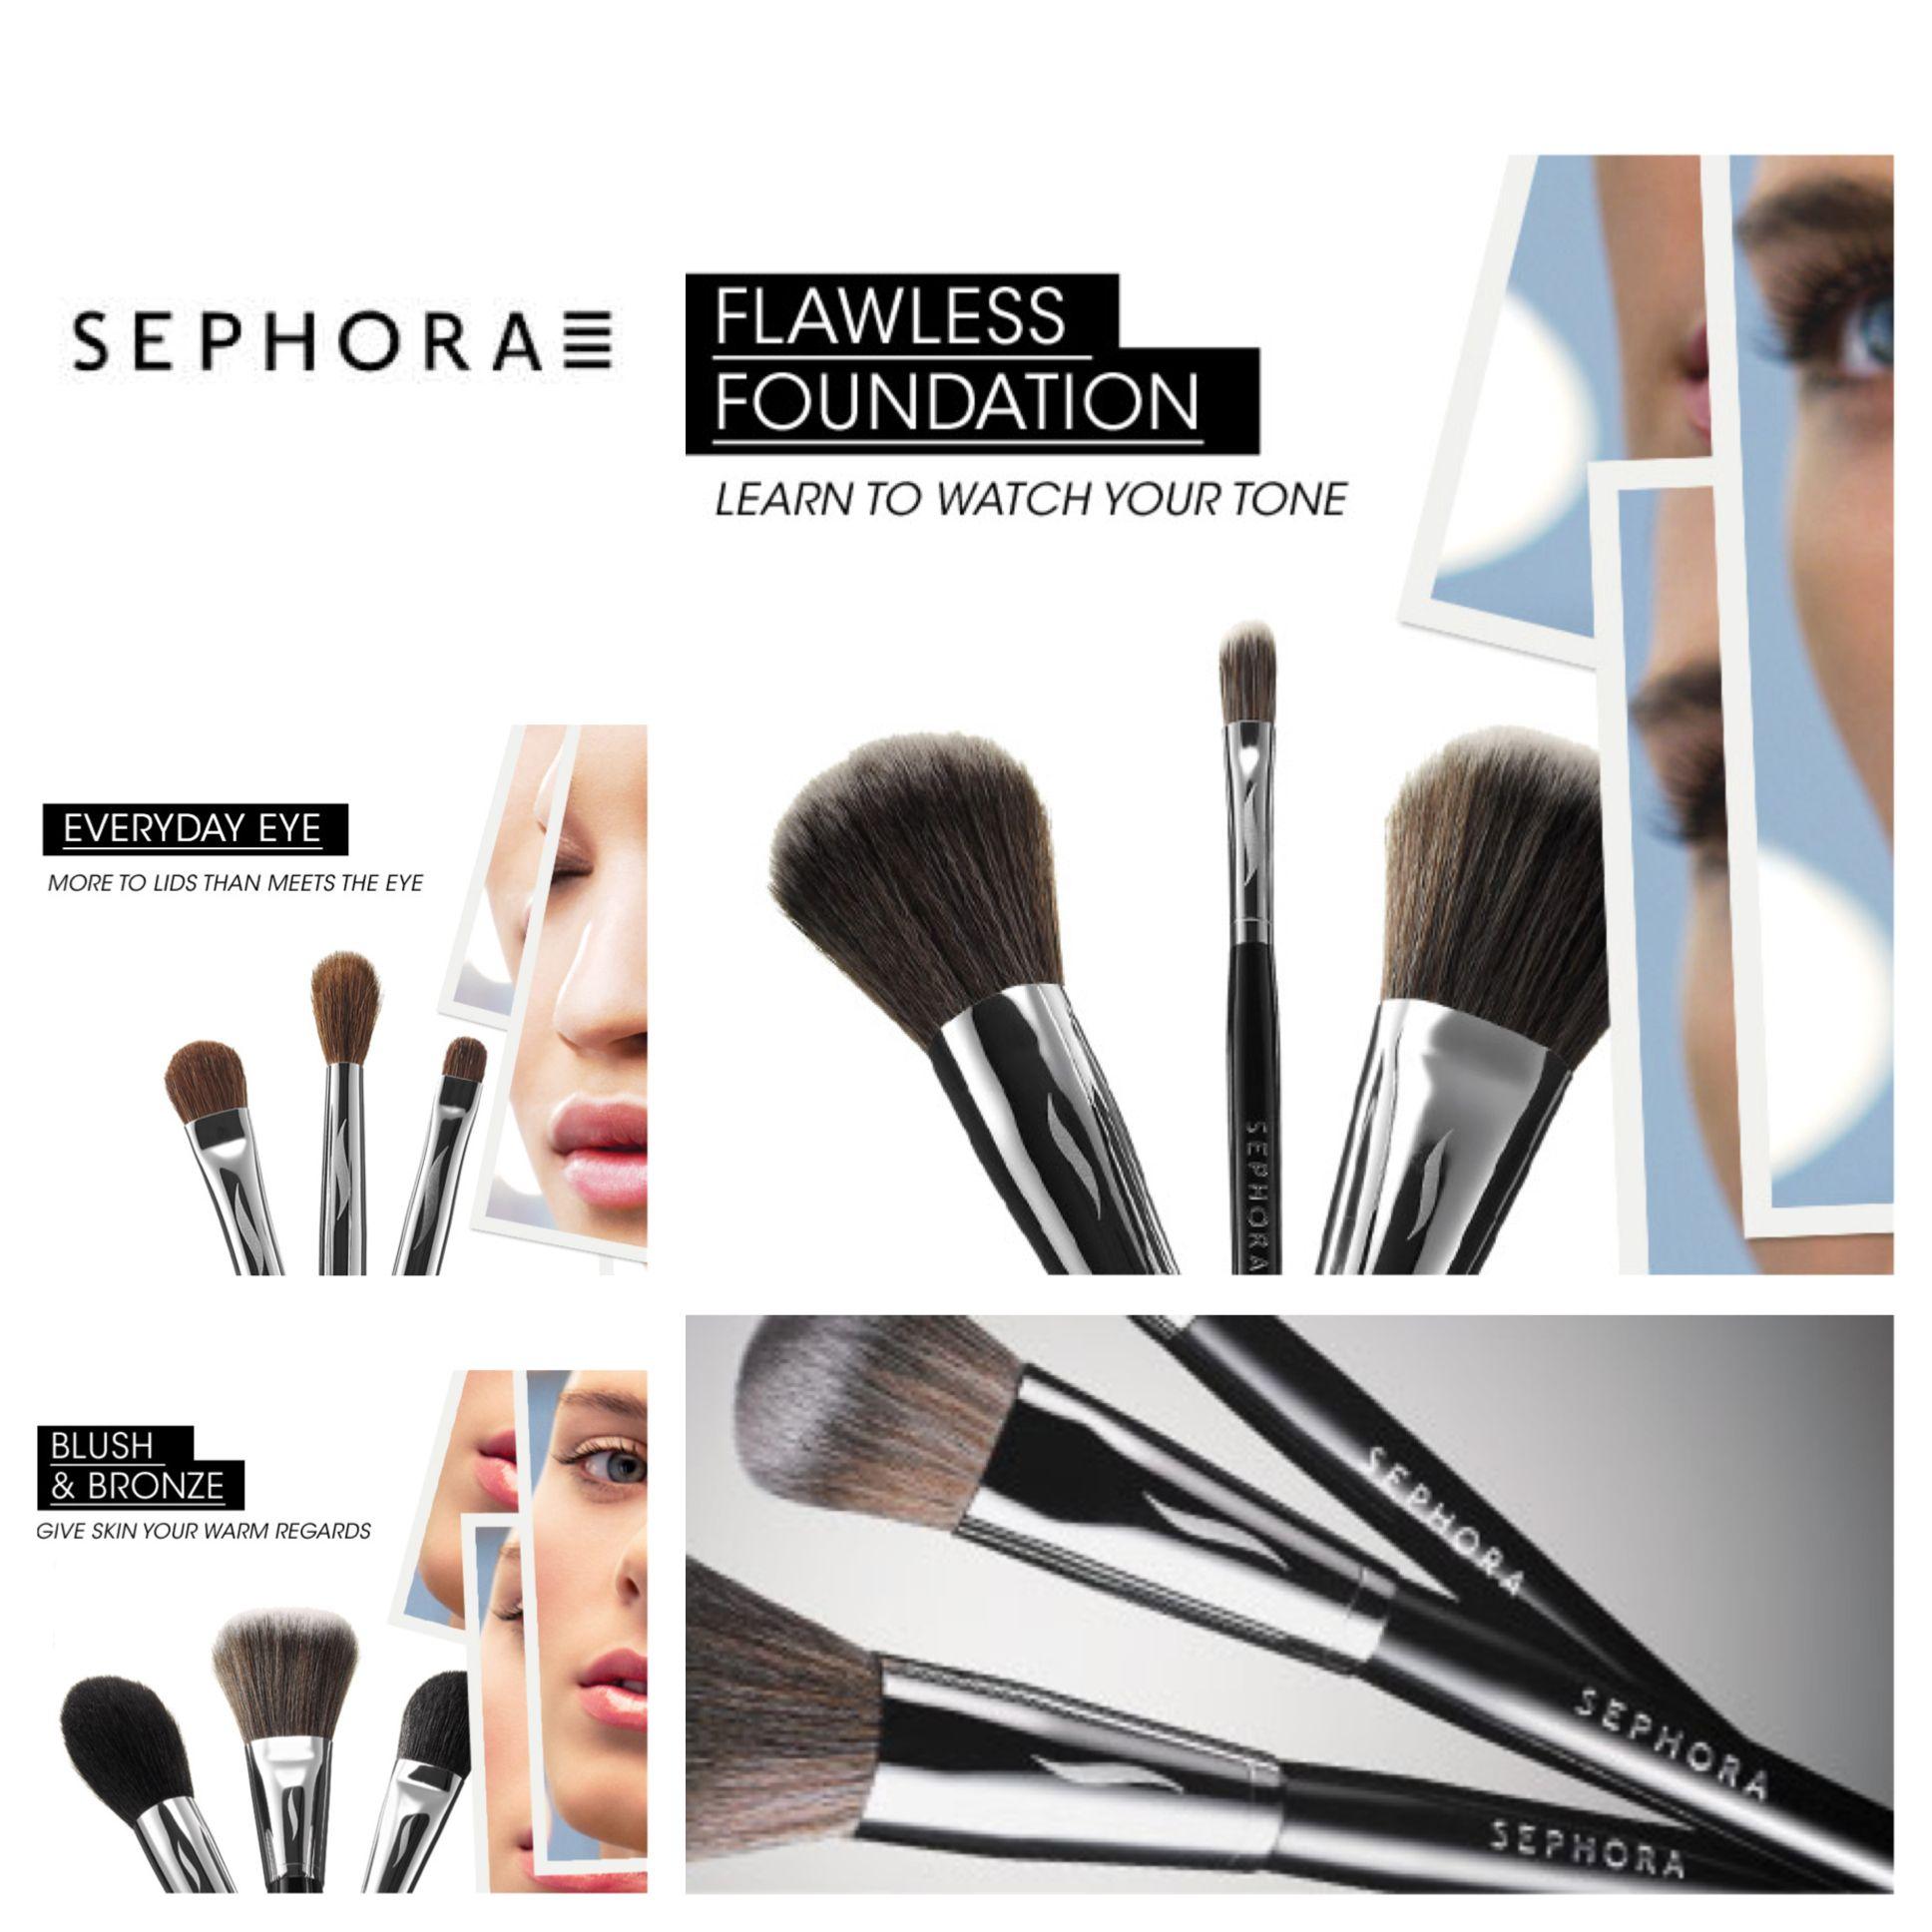 Sephora will be showcasing their PRO makeup brush